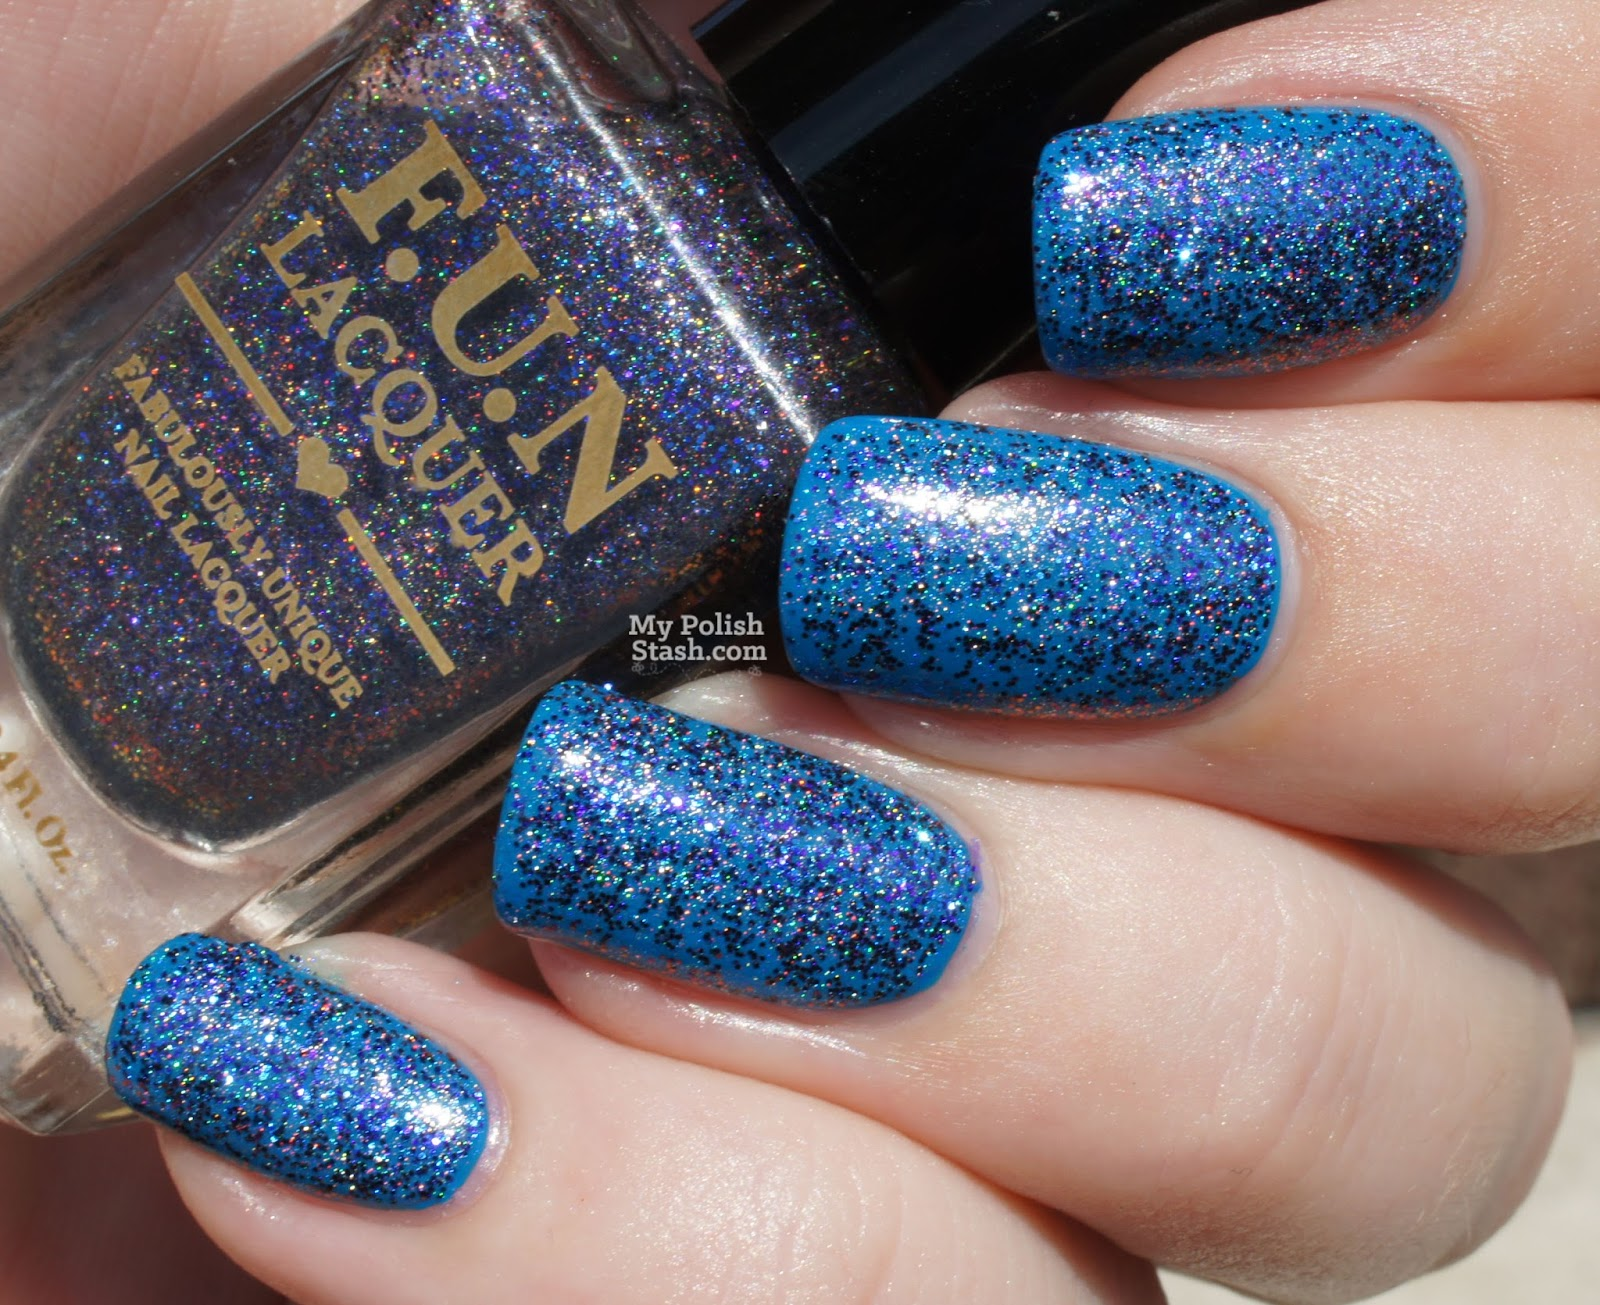 My Polish Stash: F.U.N. Lacquer - Style (H)